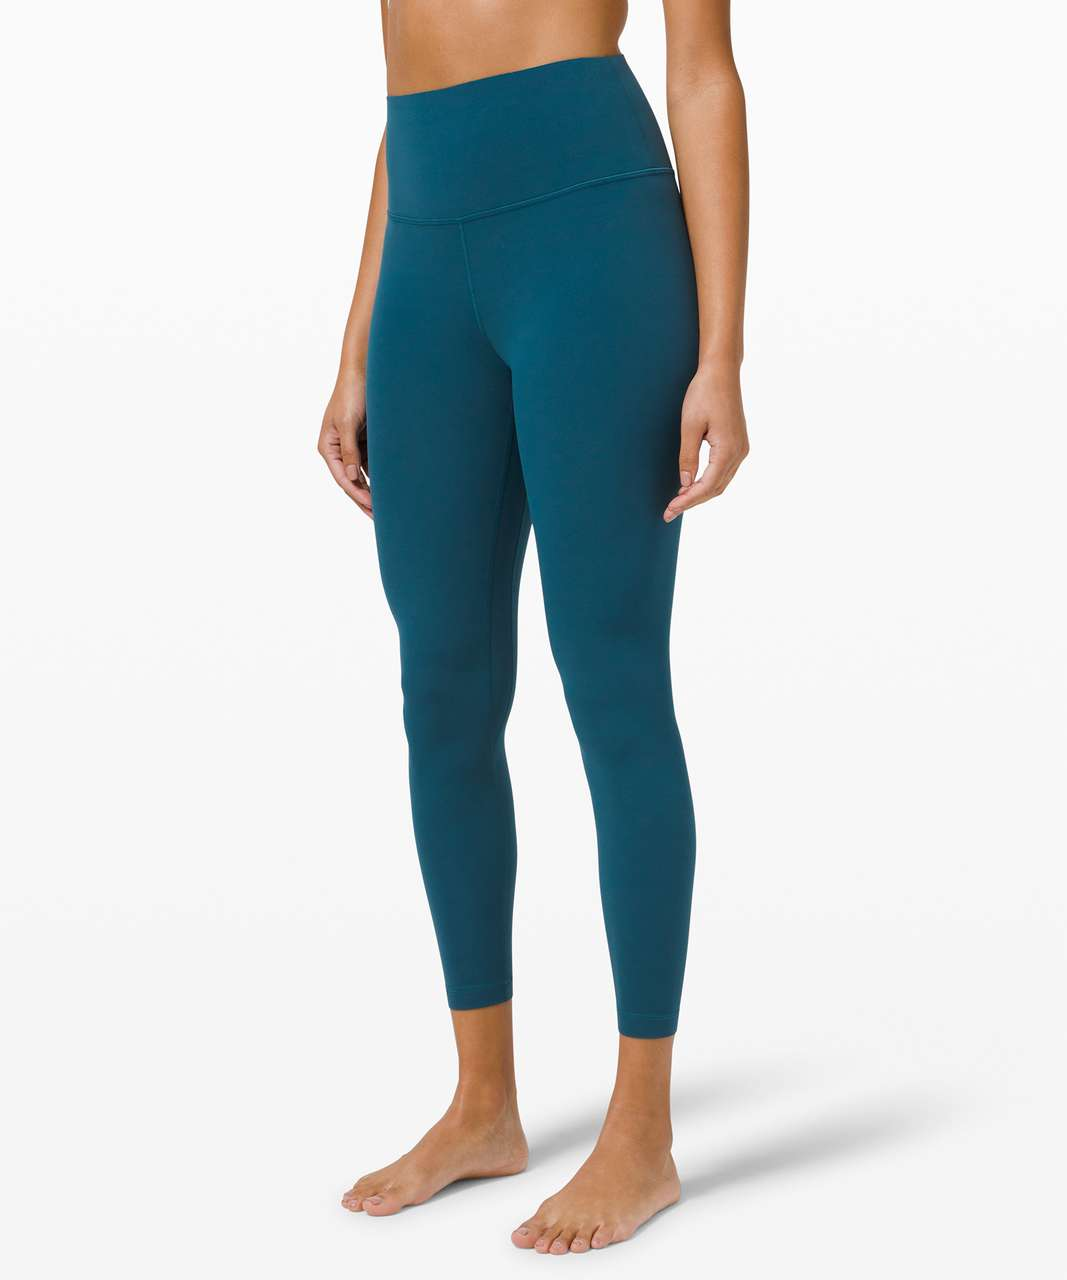 "Lululemon Align Pant 25"" - Blue Borealis"